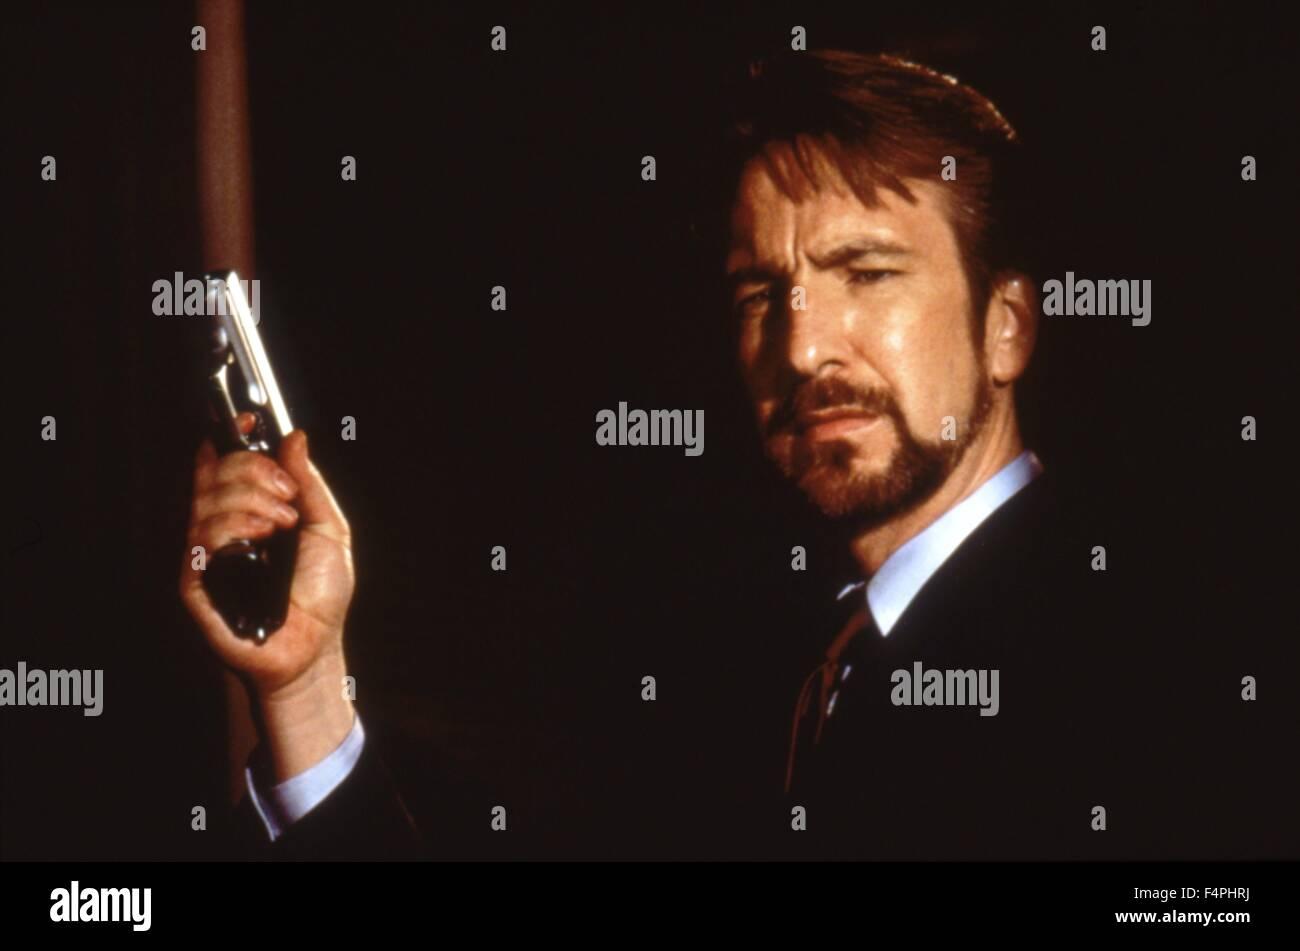 Alan Rickman / Die Hard / 1988 directed by John McTiernan [20th Century Fox] - Stock Image